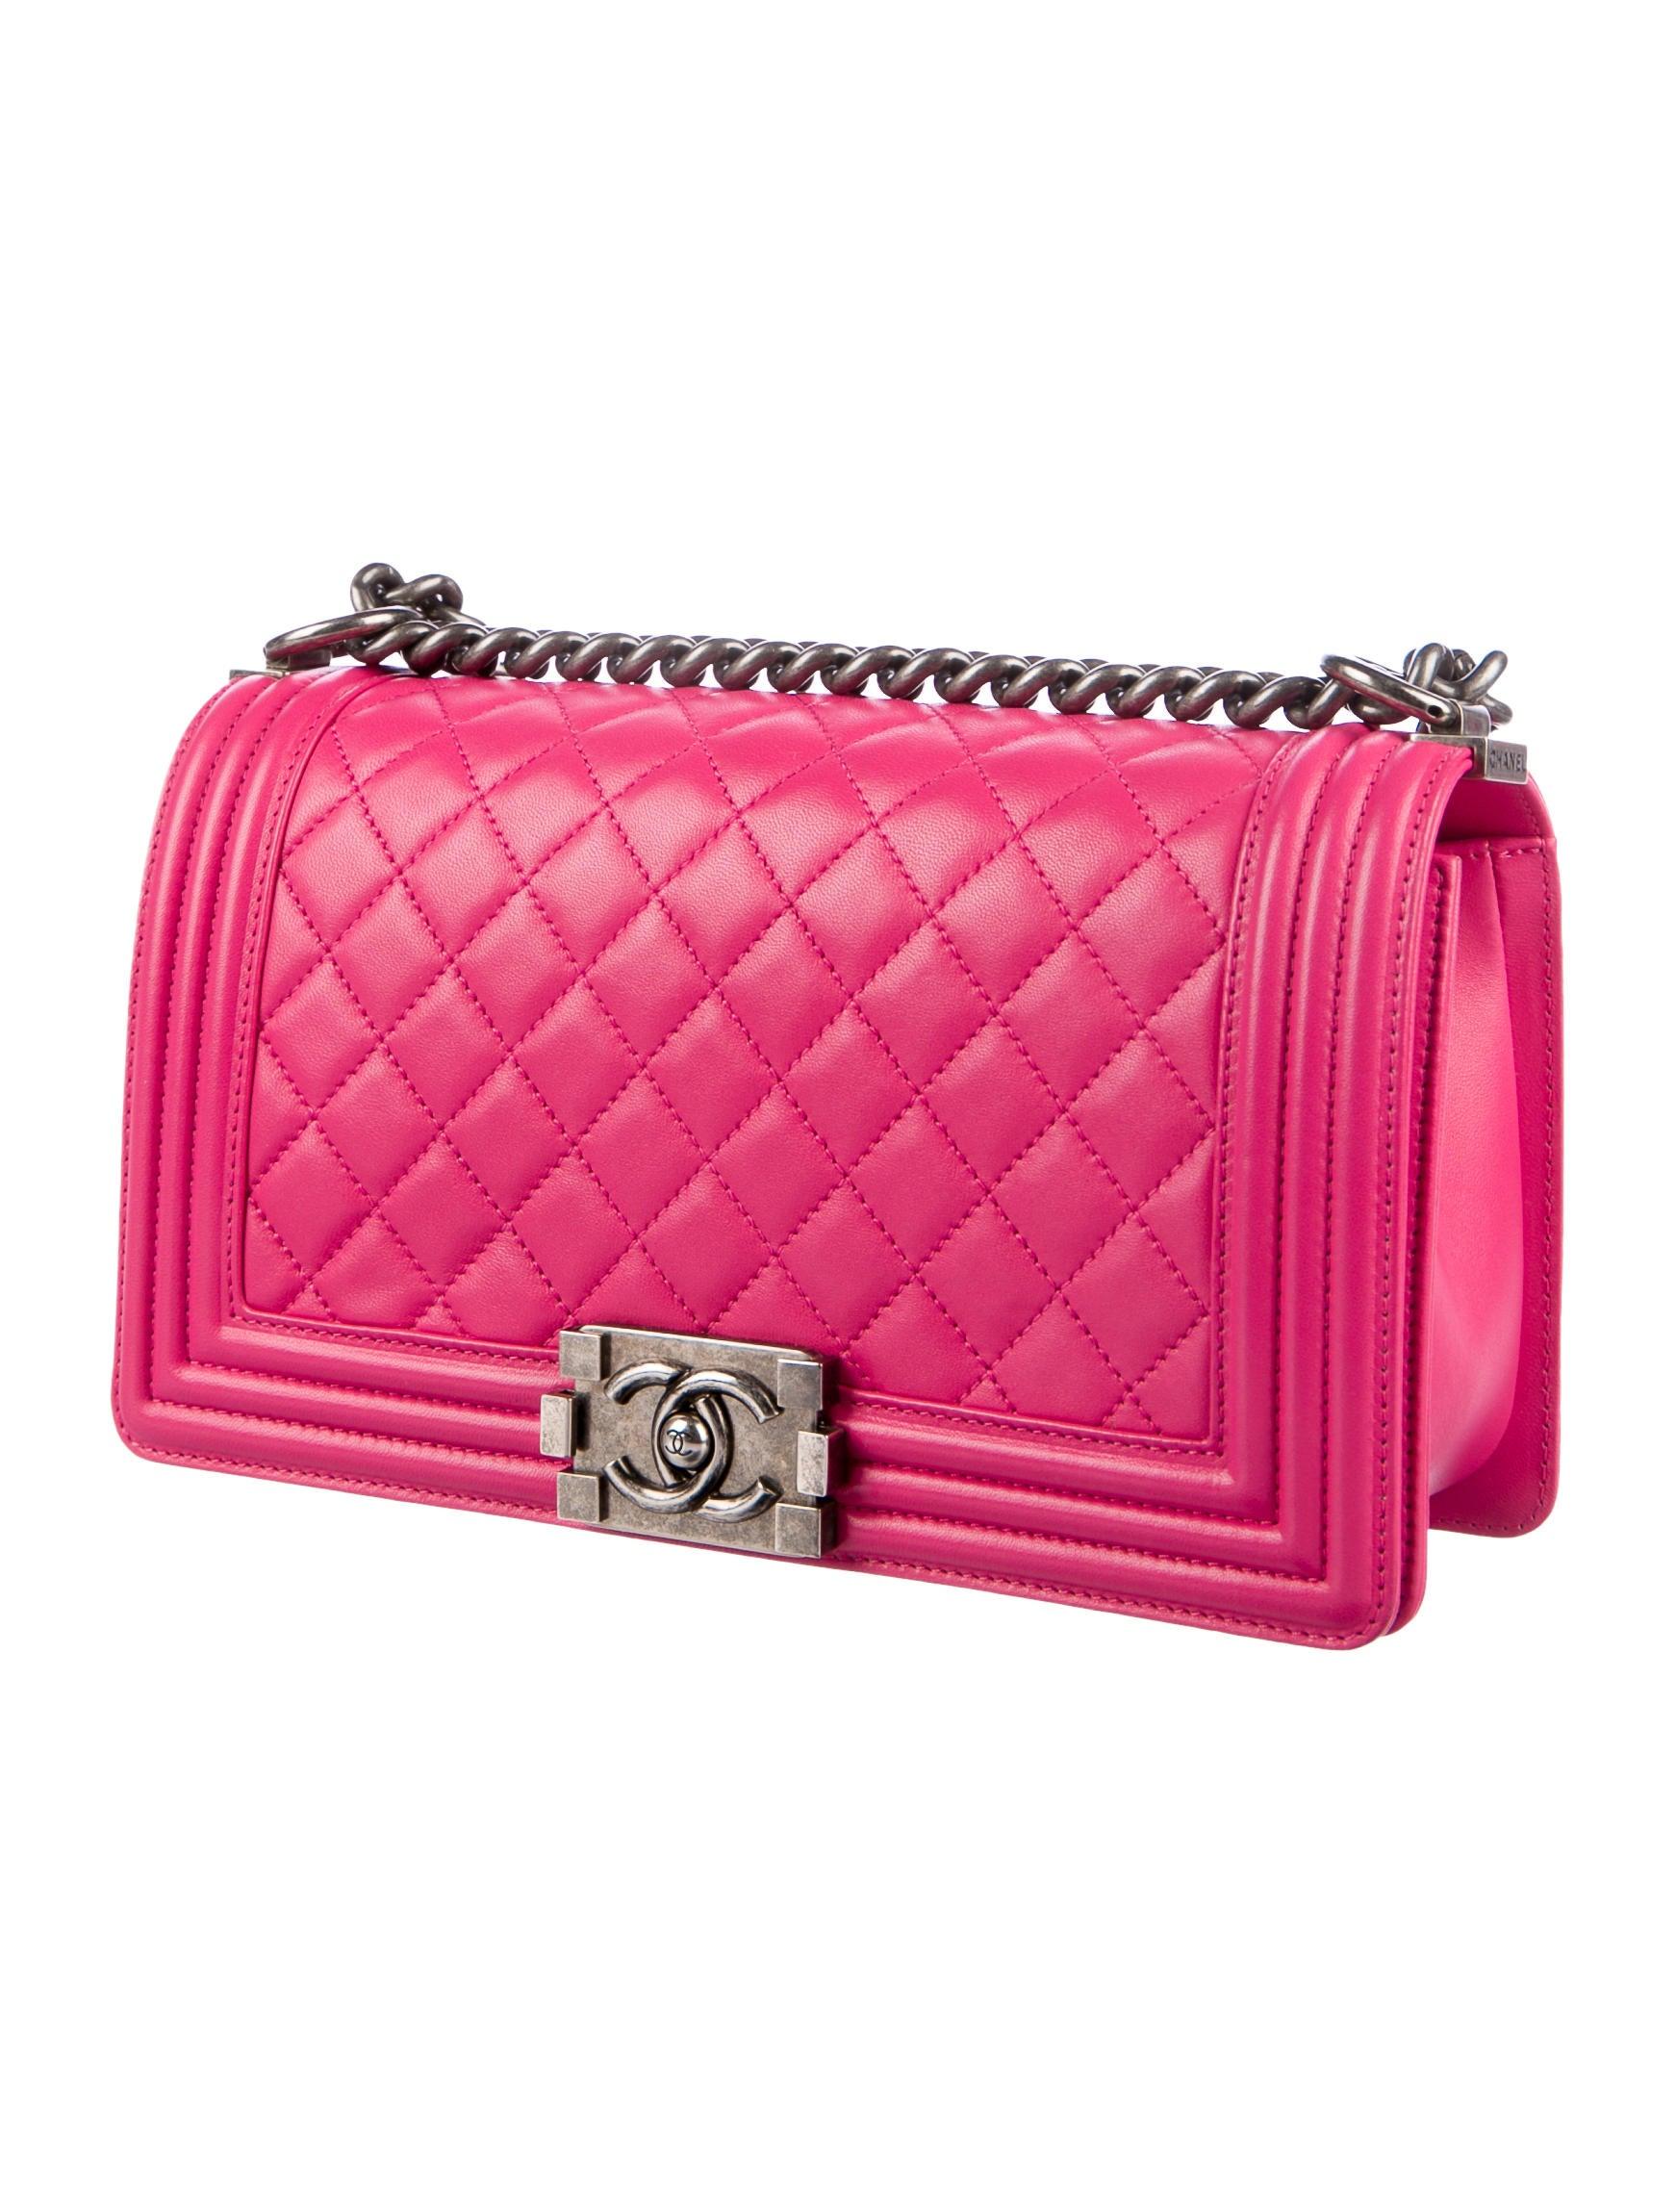 6bb9cbac4dcc32 Chanel 2014 Medium Boy Bag w/ Tags - Handbags - CHA209354 | The RealReal